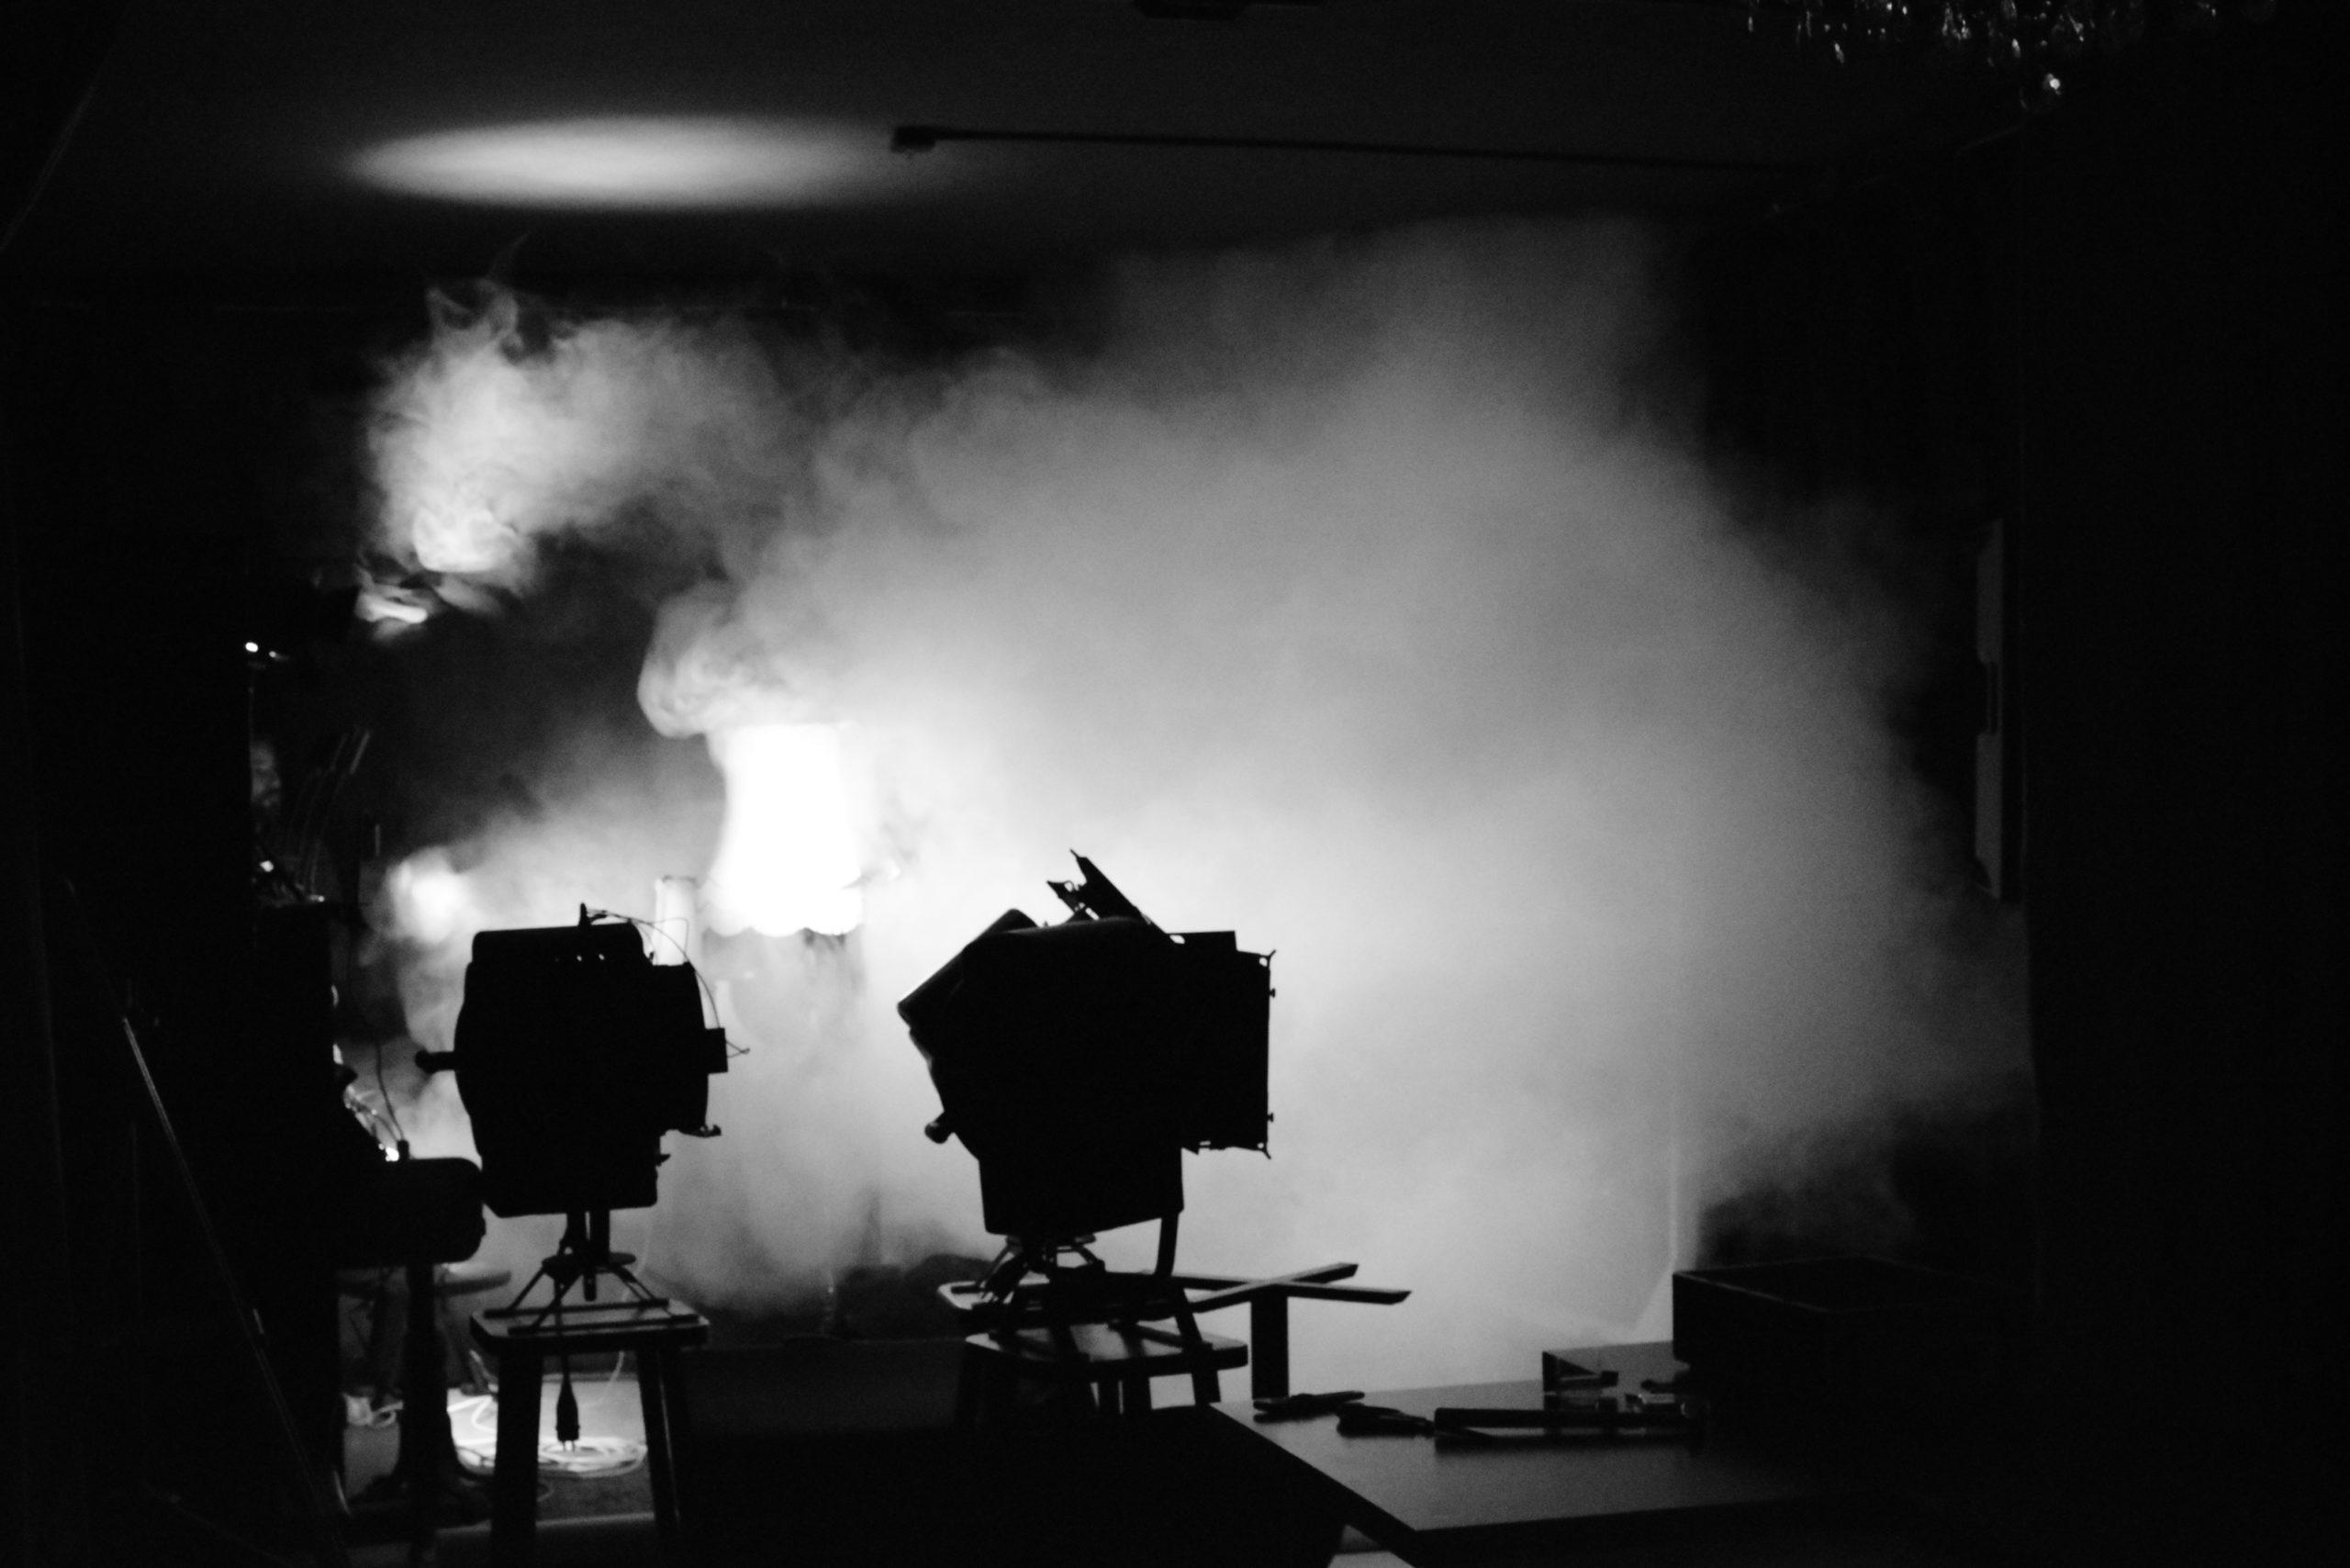 KNH-Darkroom #6